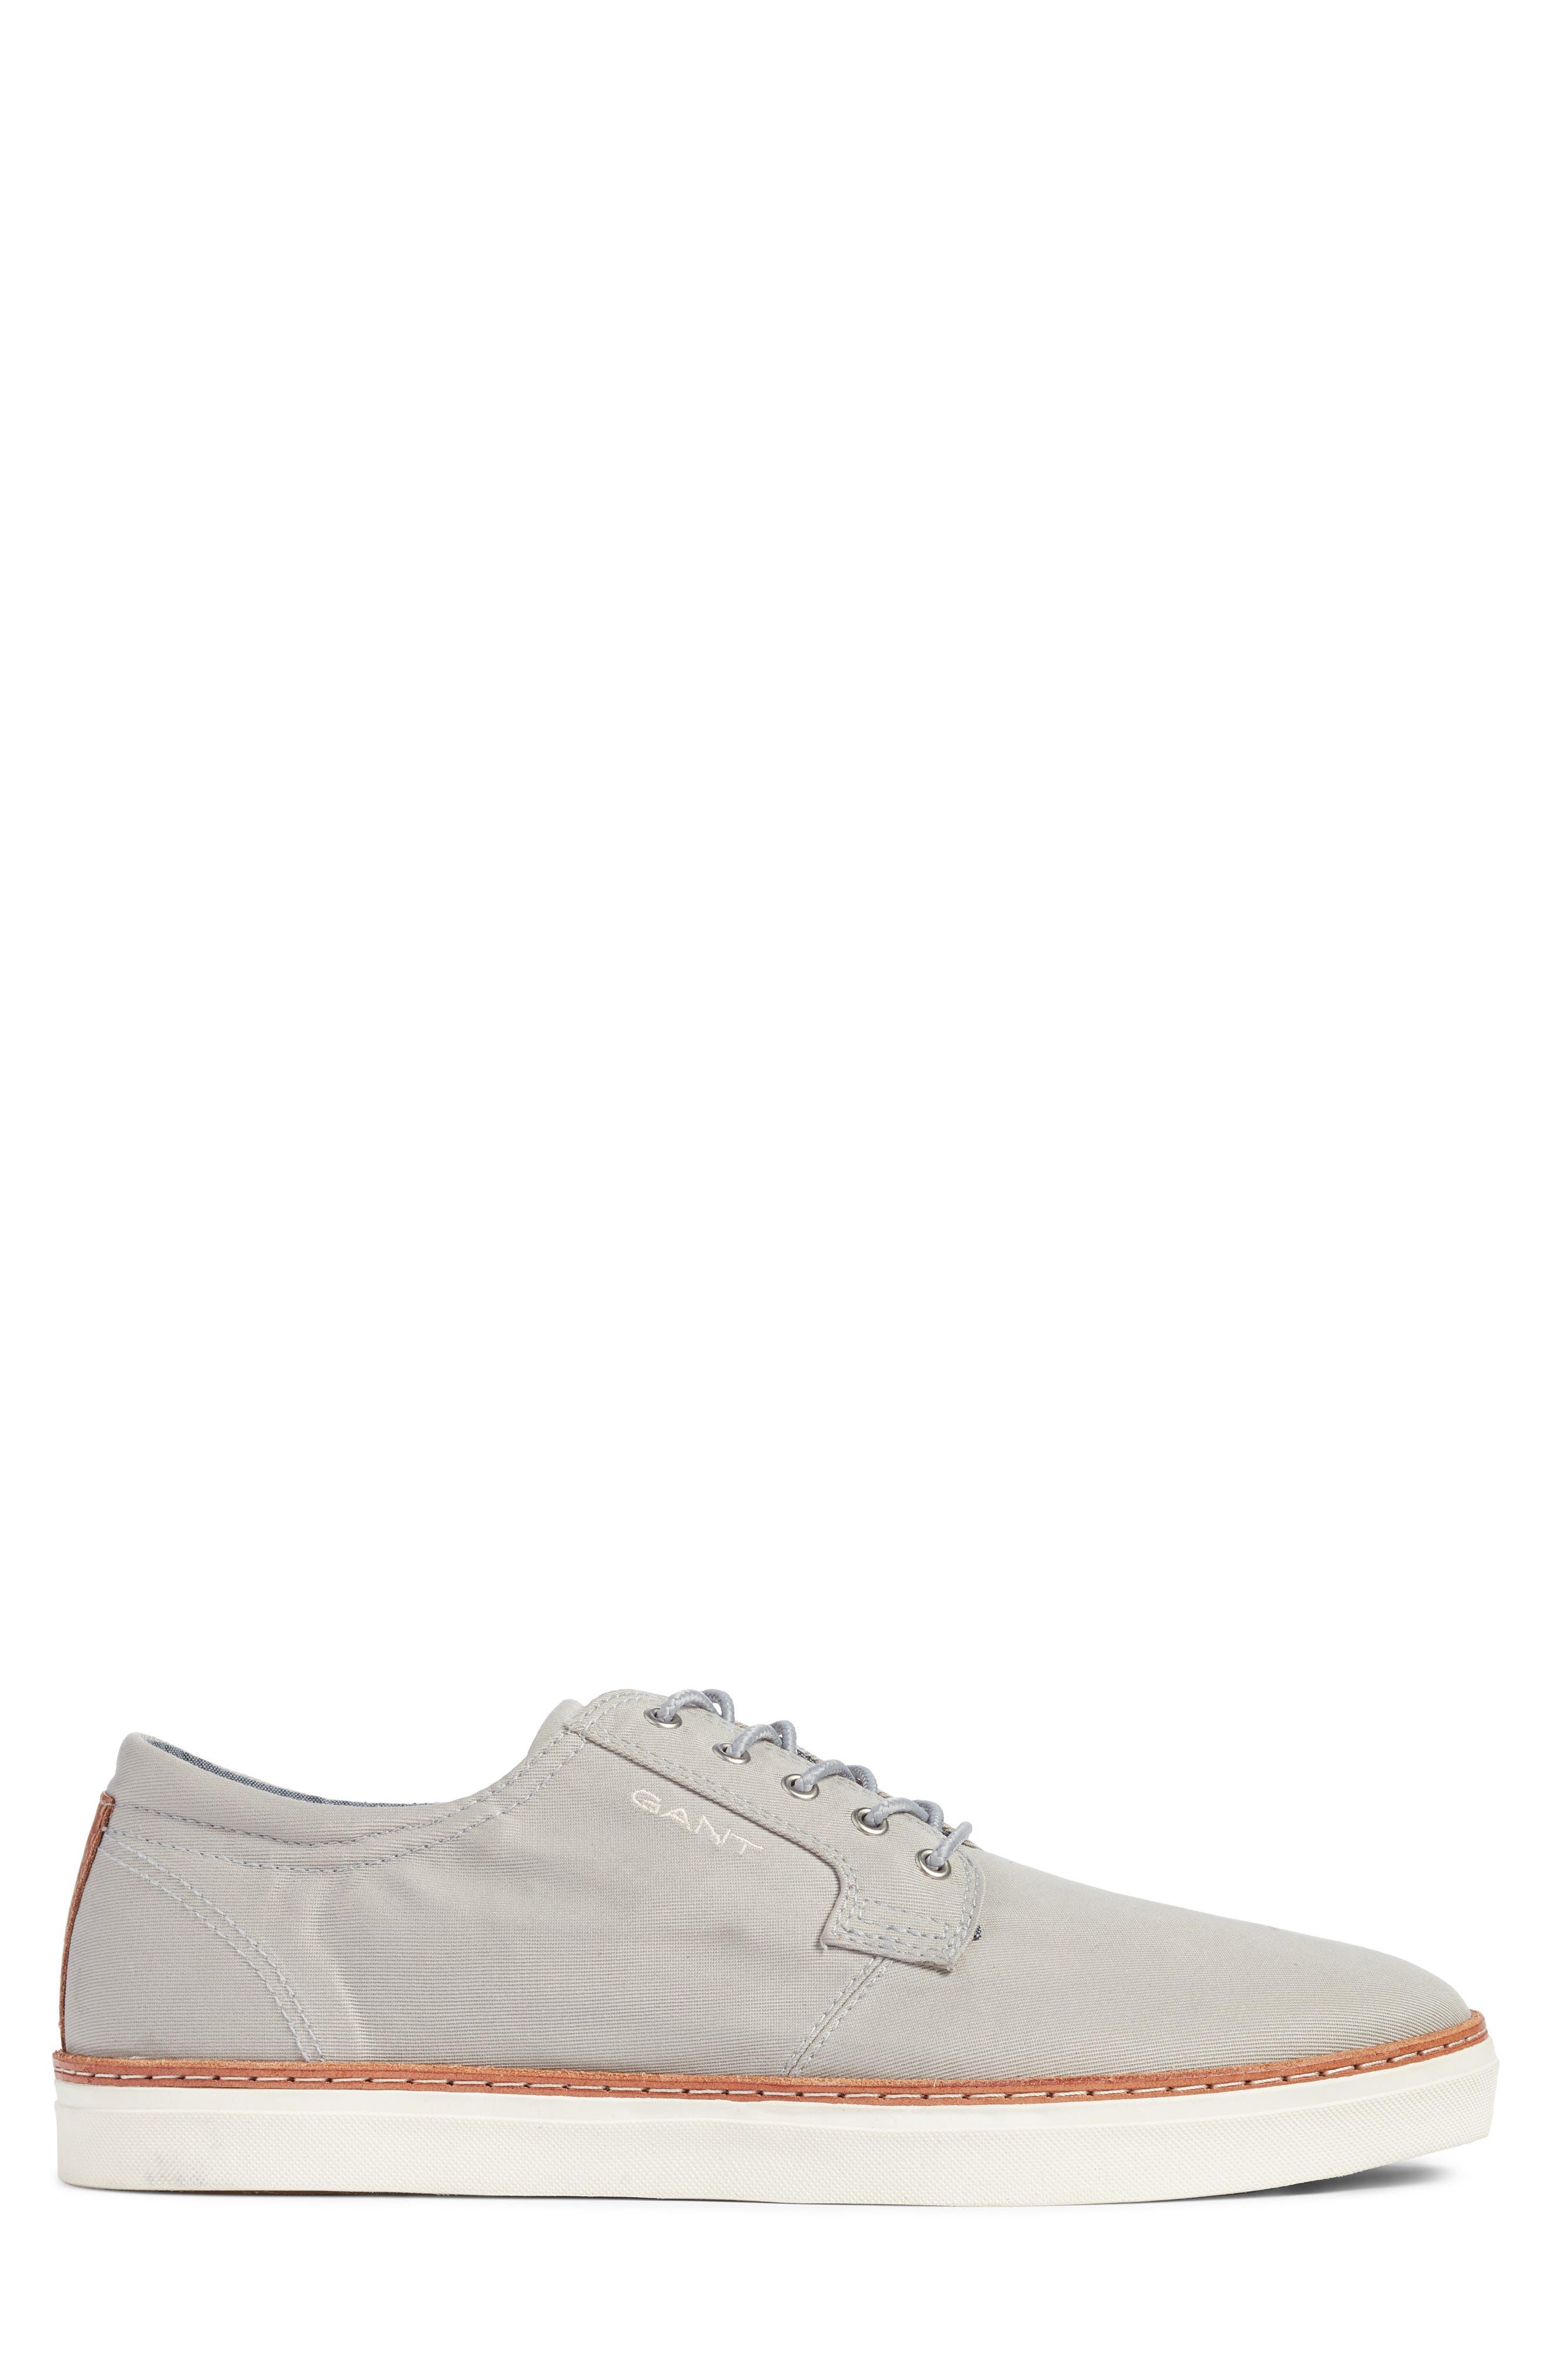 Bari Sneaker,                             Alternate thumbnail 3, color,                             SLEET GRAY